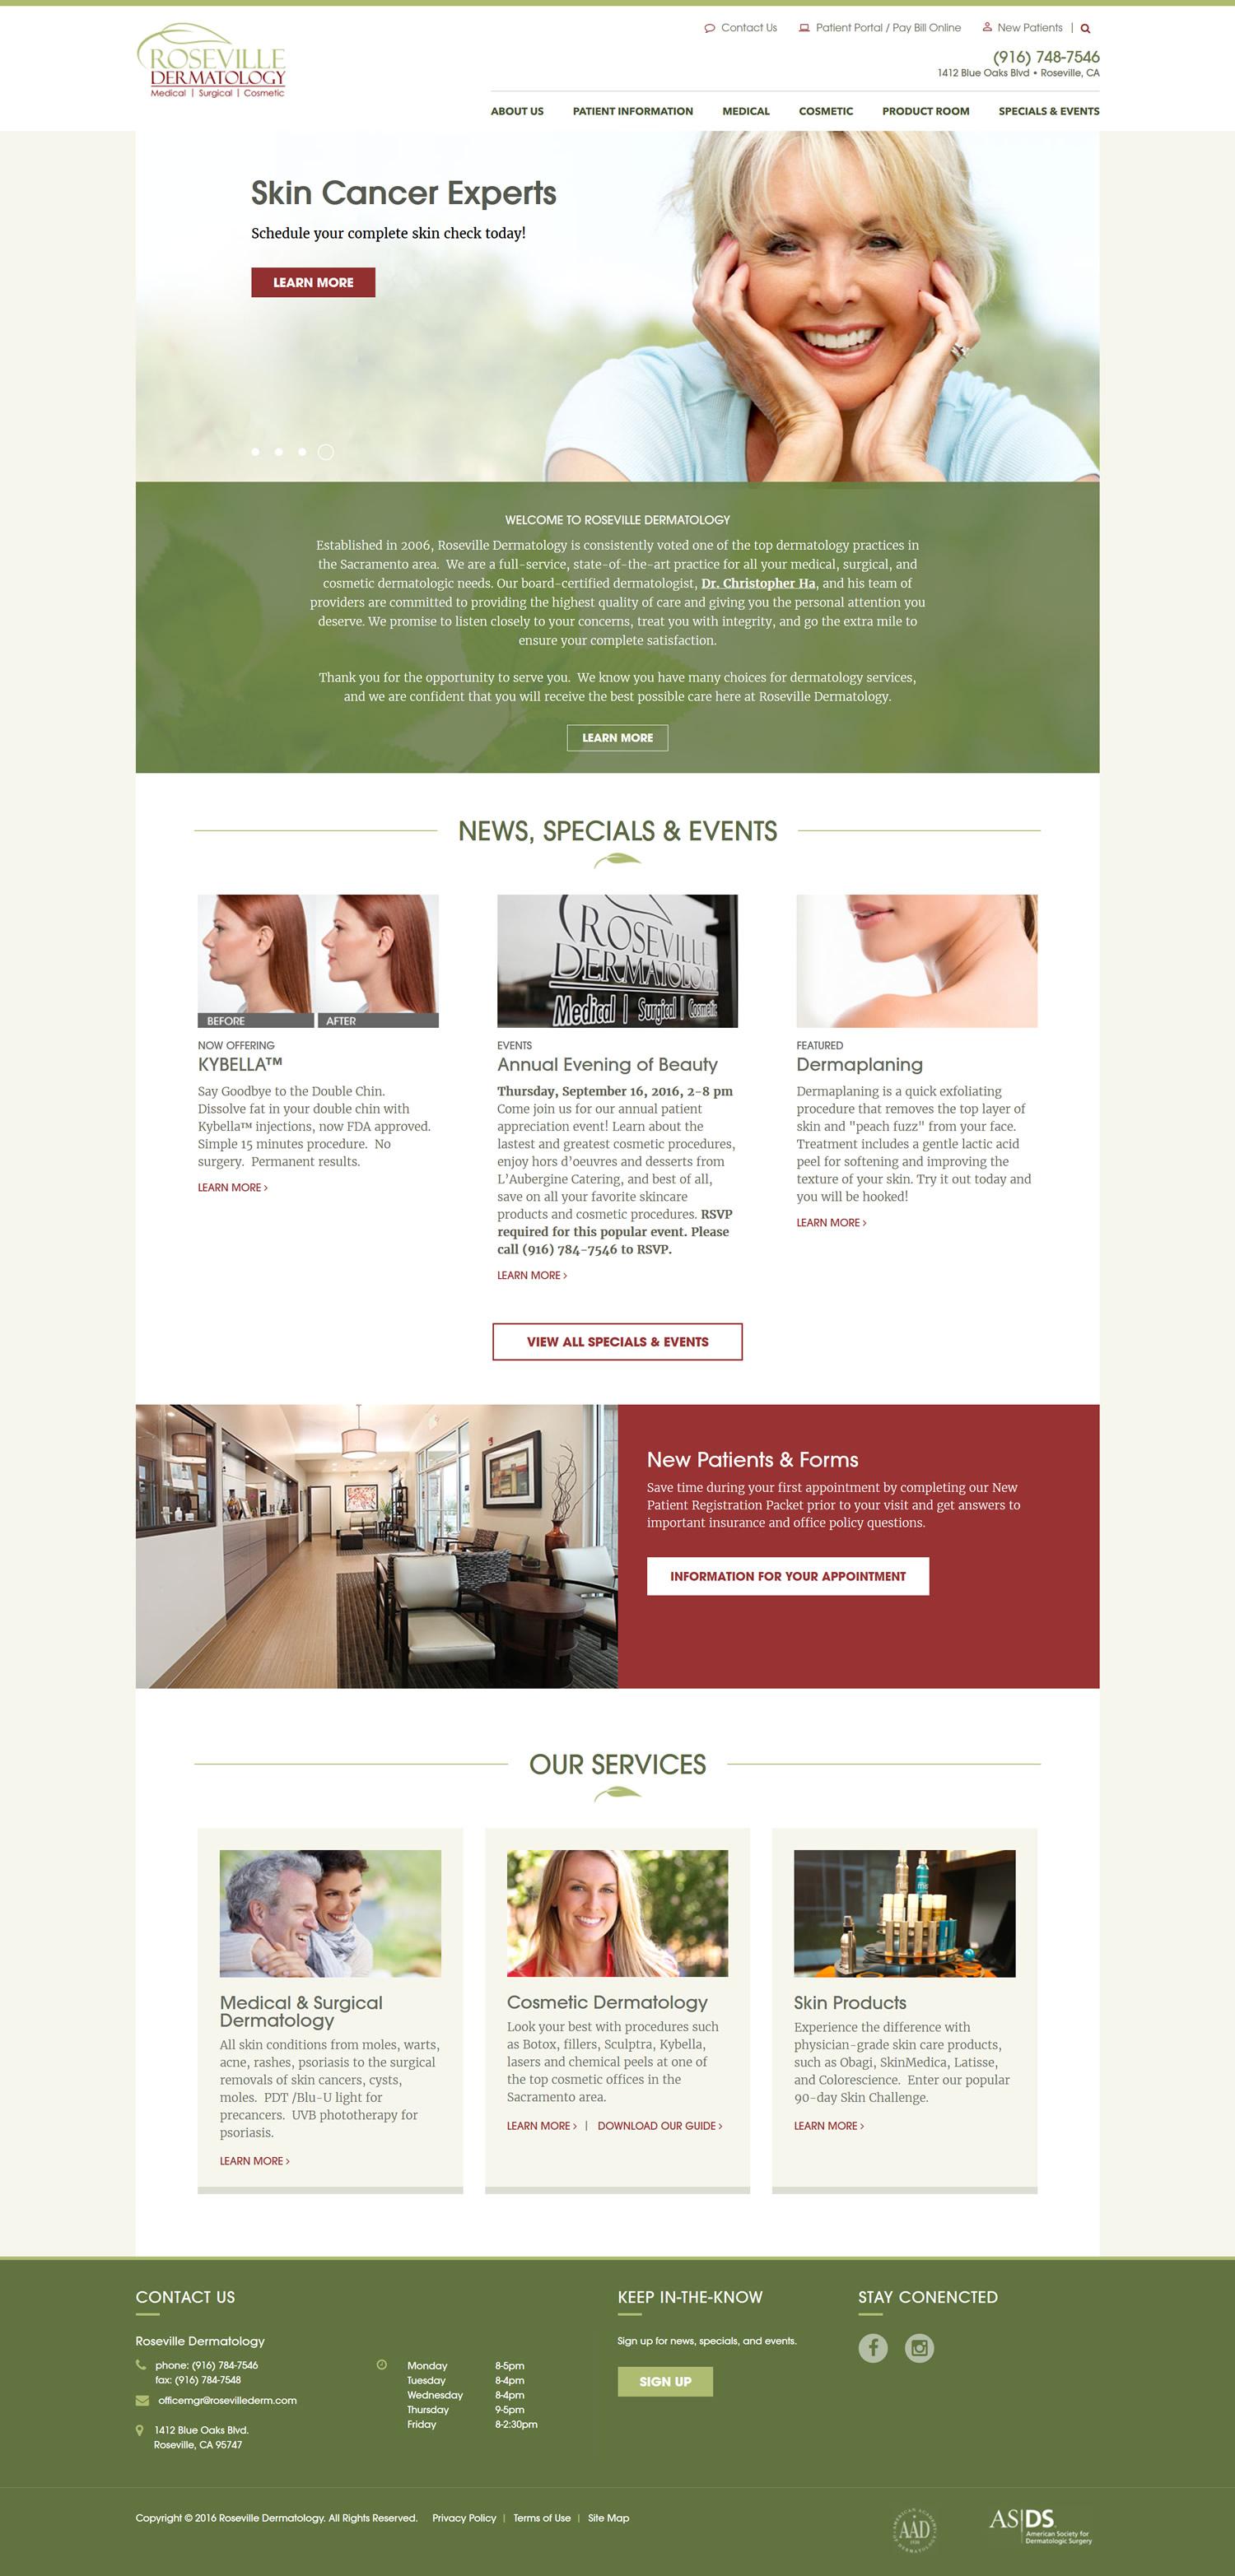 roseville-dermatology